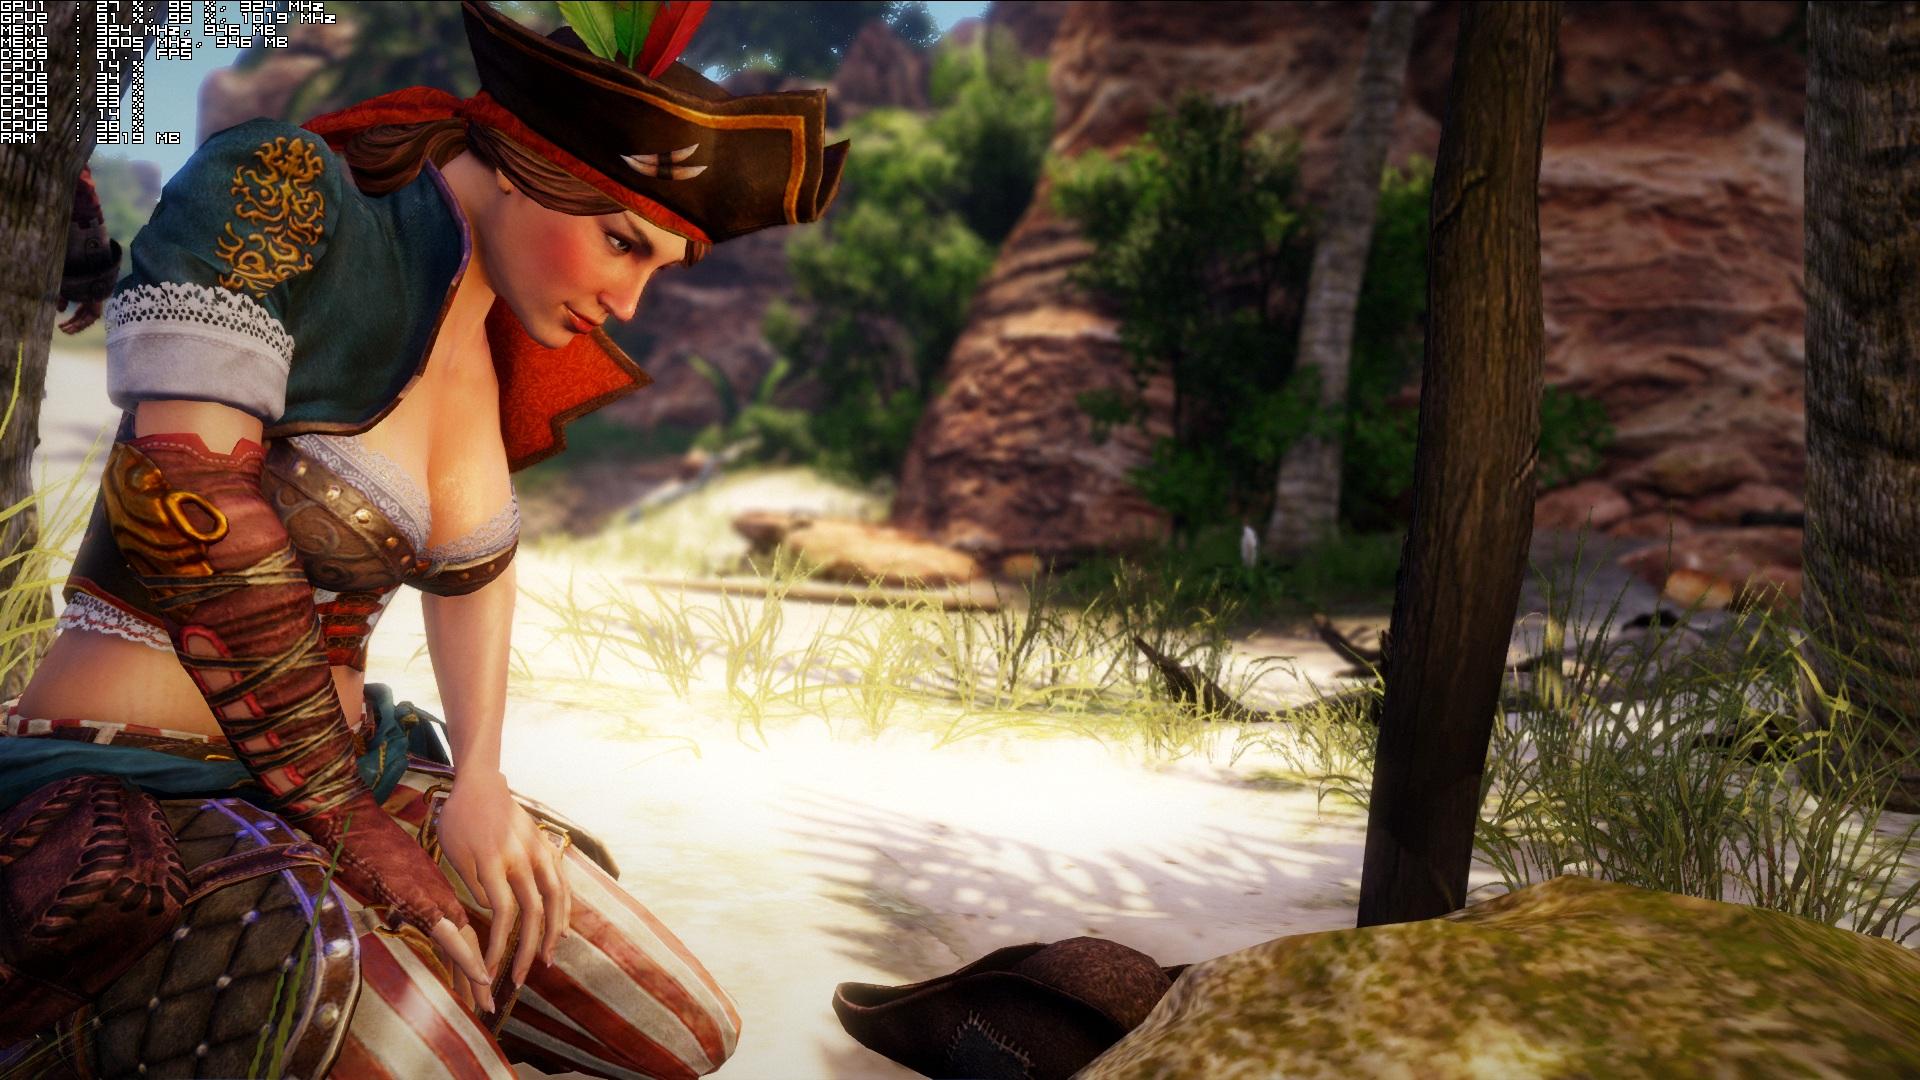 Risen 3 - Titan Lords Gameplay (PC HD) - YouTube